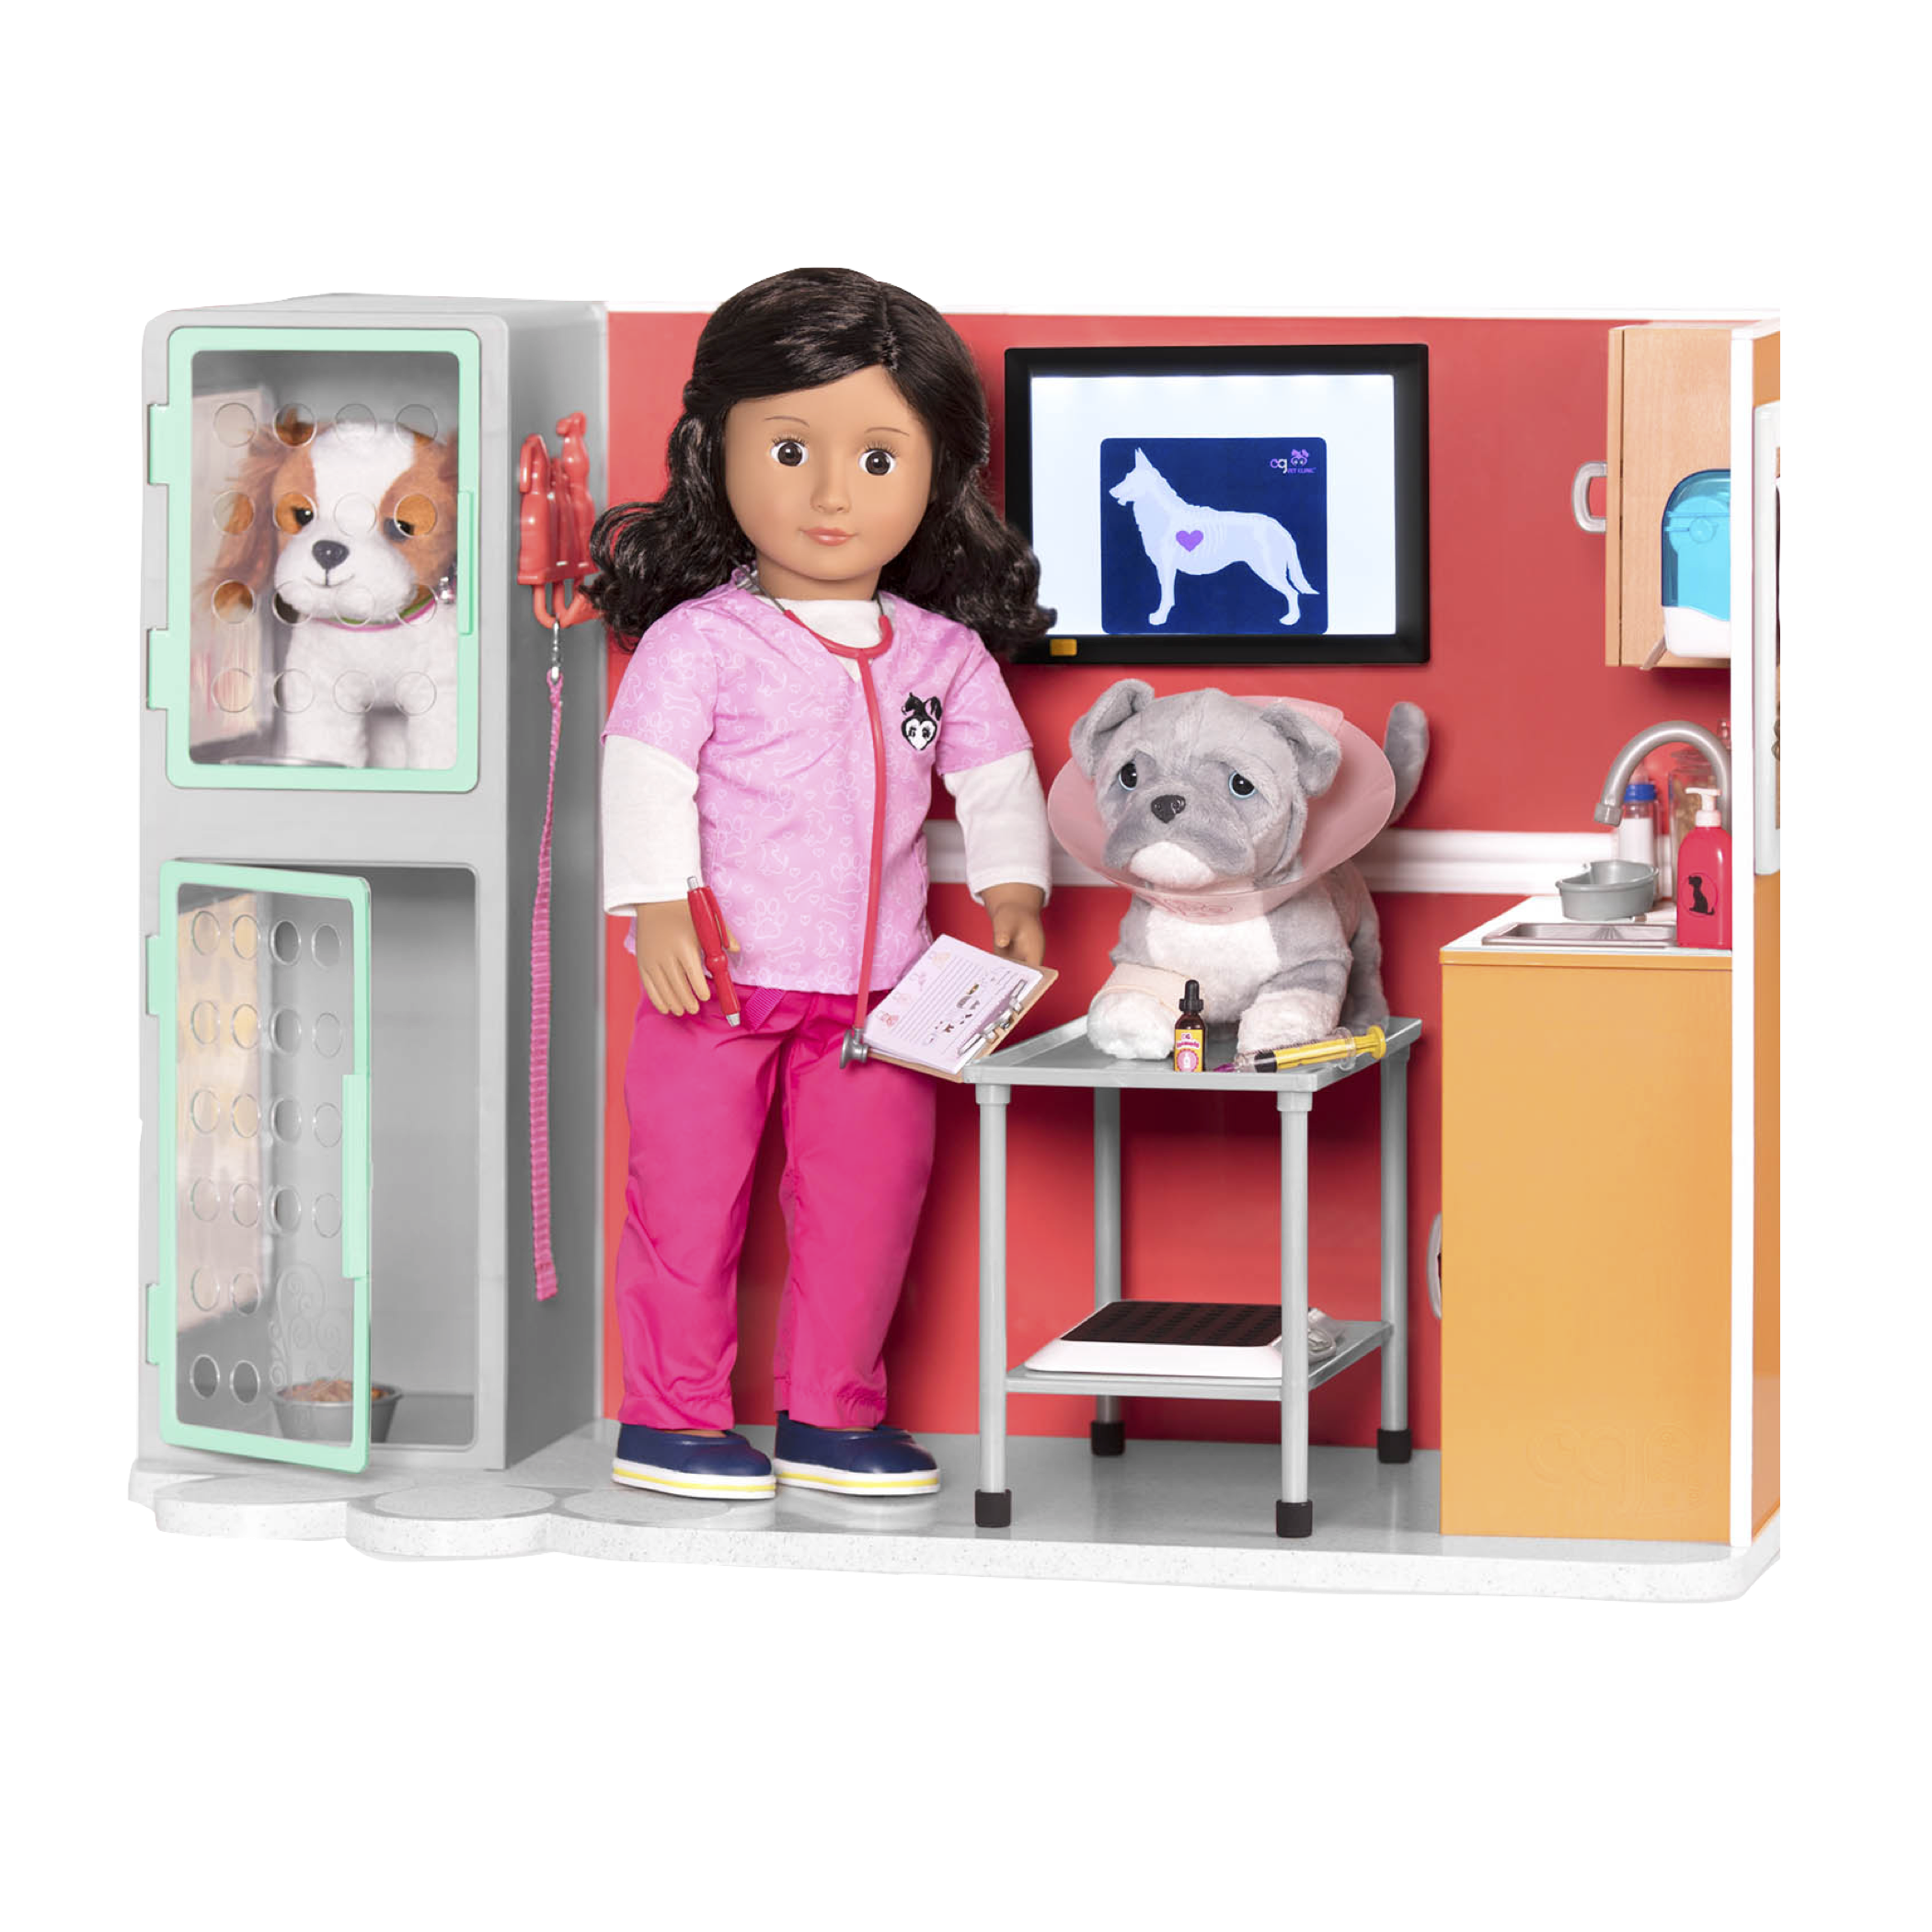 Pitbull Pup with paloma Vet Doll in Vet clinic